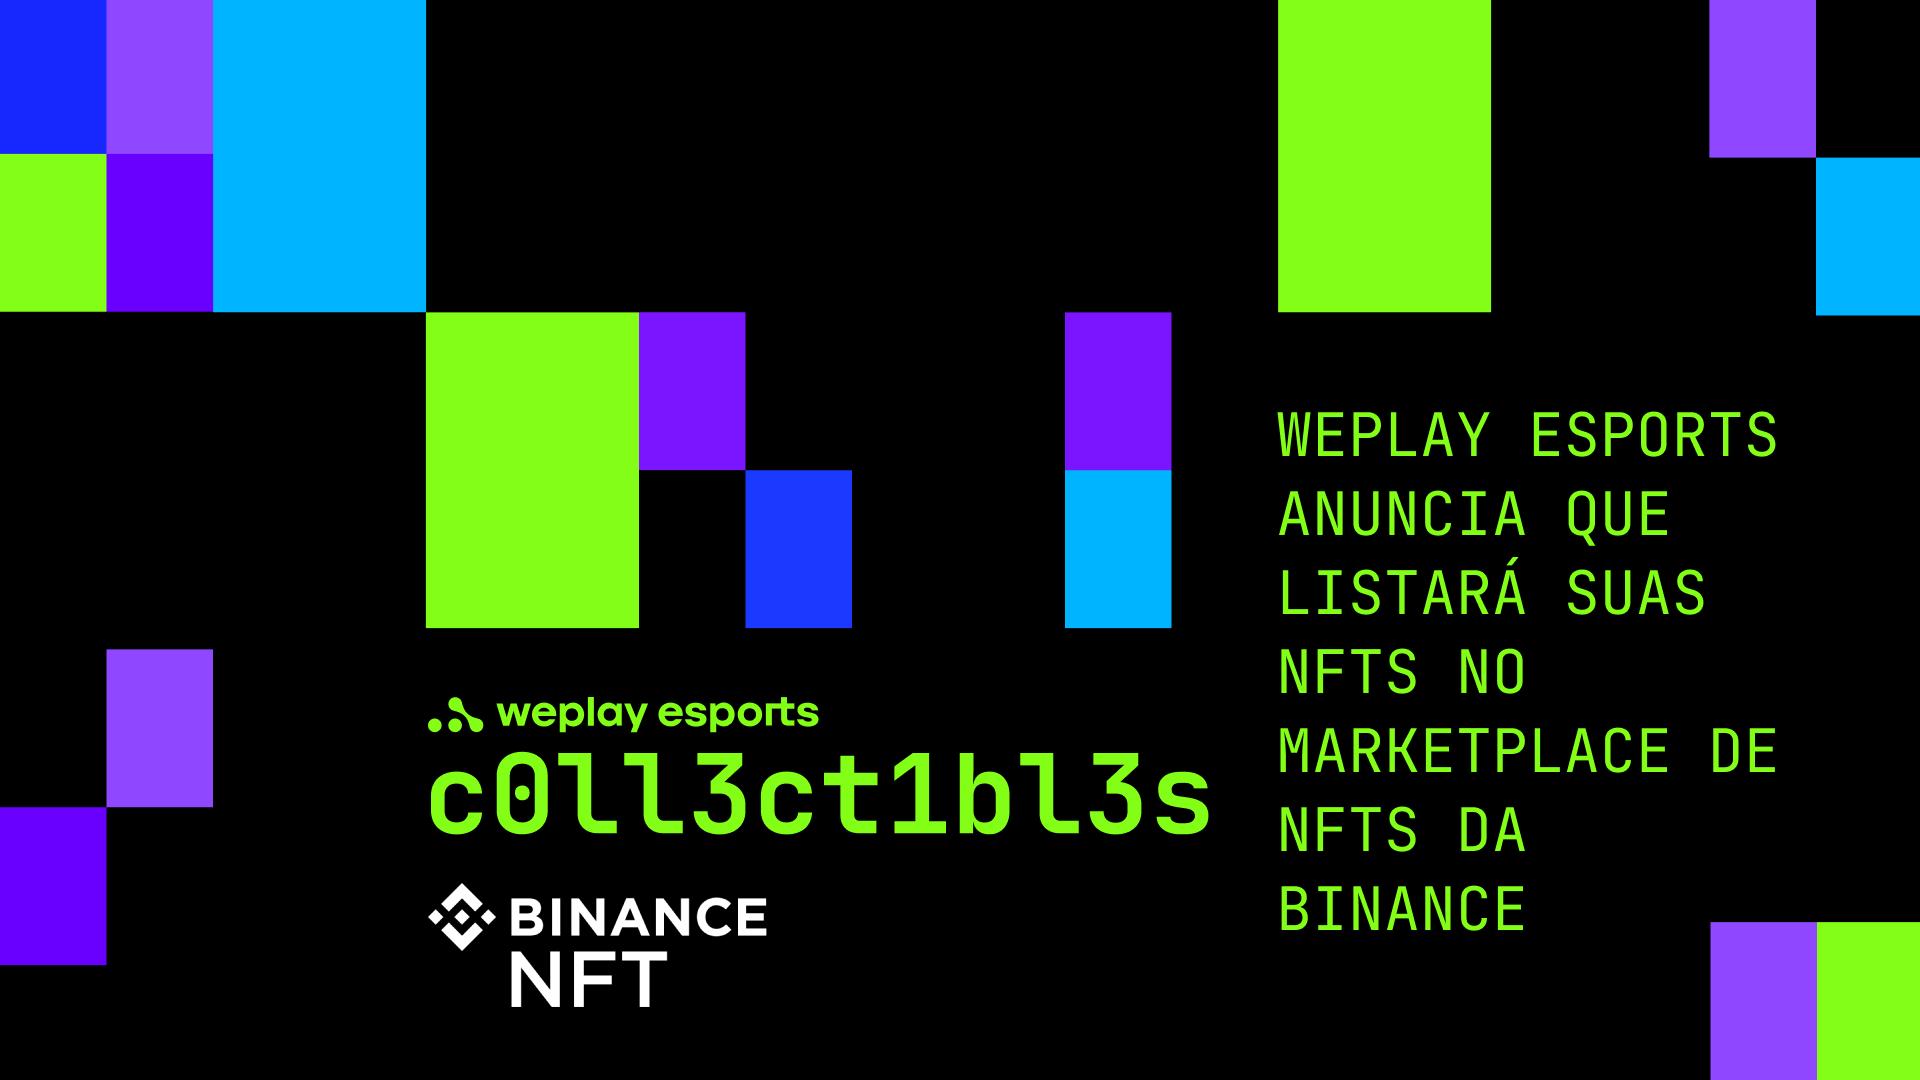 Binance e WePlay Esports anunciam parceria para NFT. Imagem: WePlay Holding